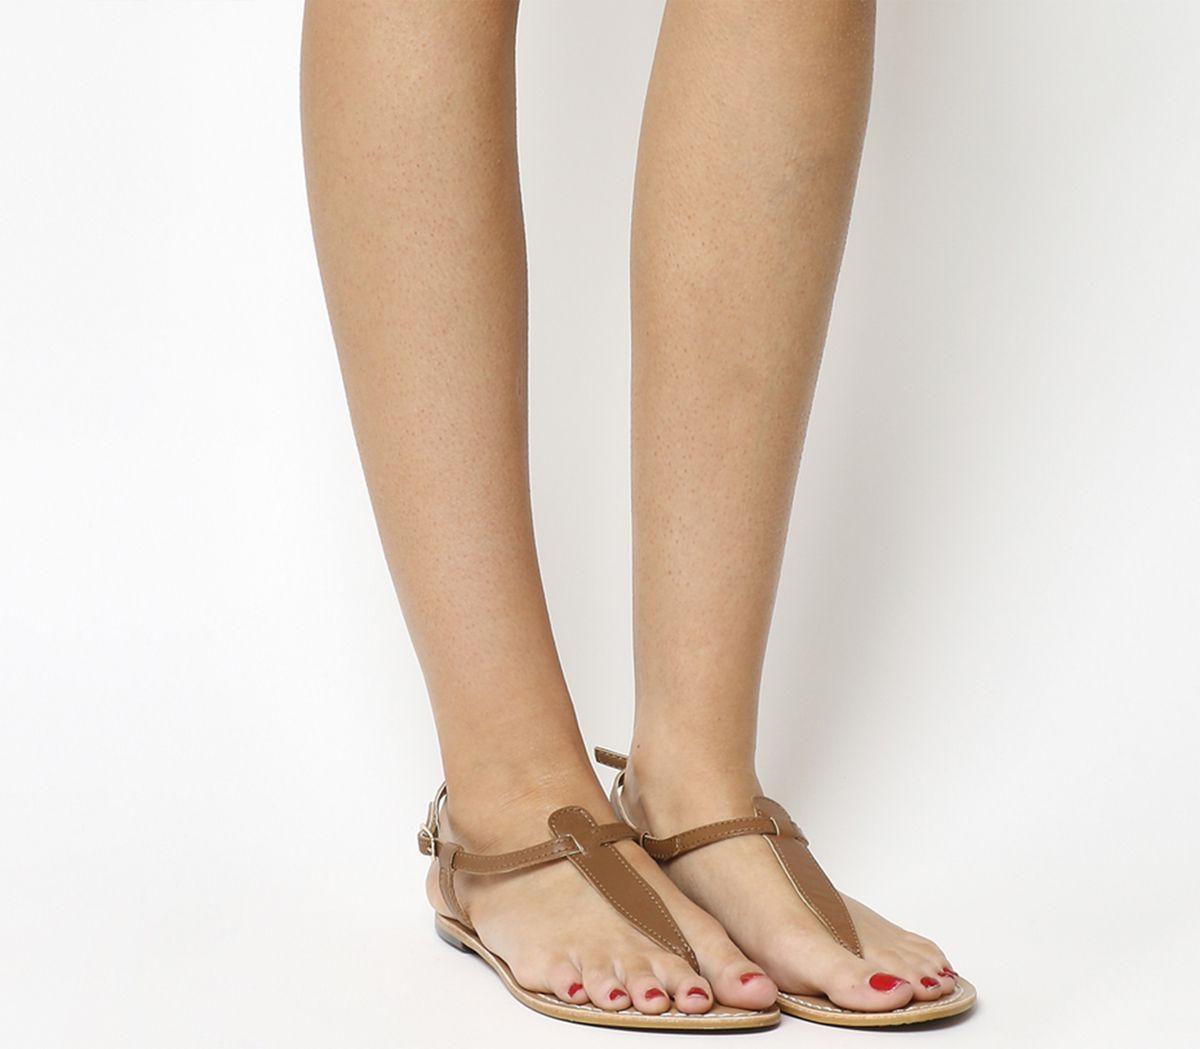 5b5ecf41d074 Office Samba Toe Post Sandals Tan Leather - Sandals